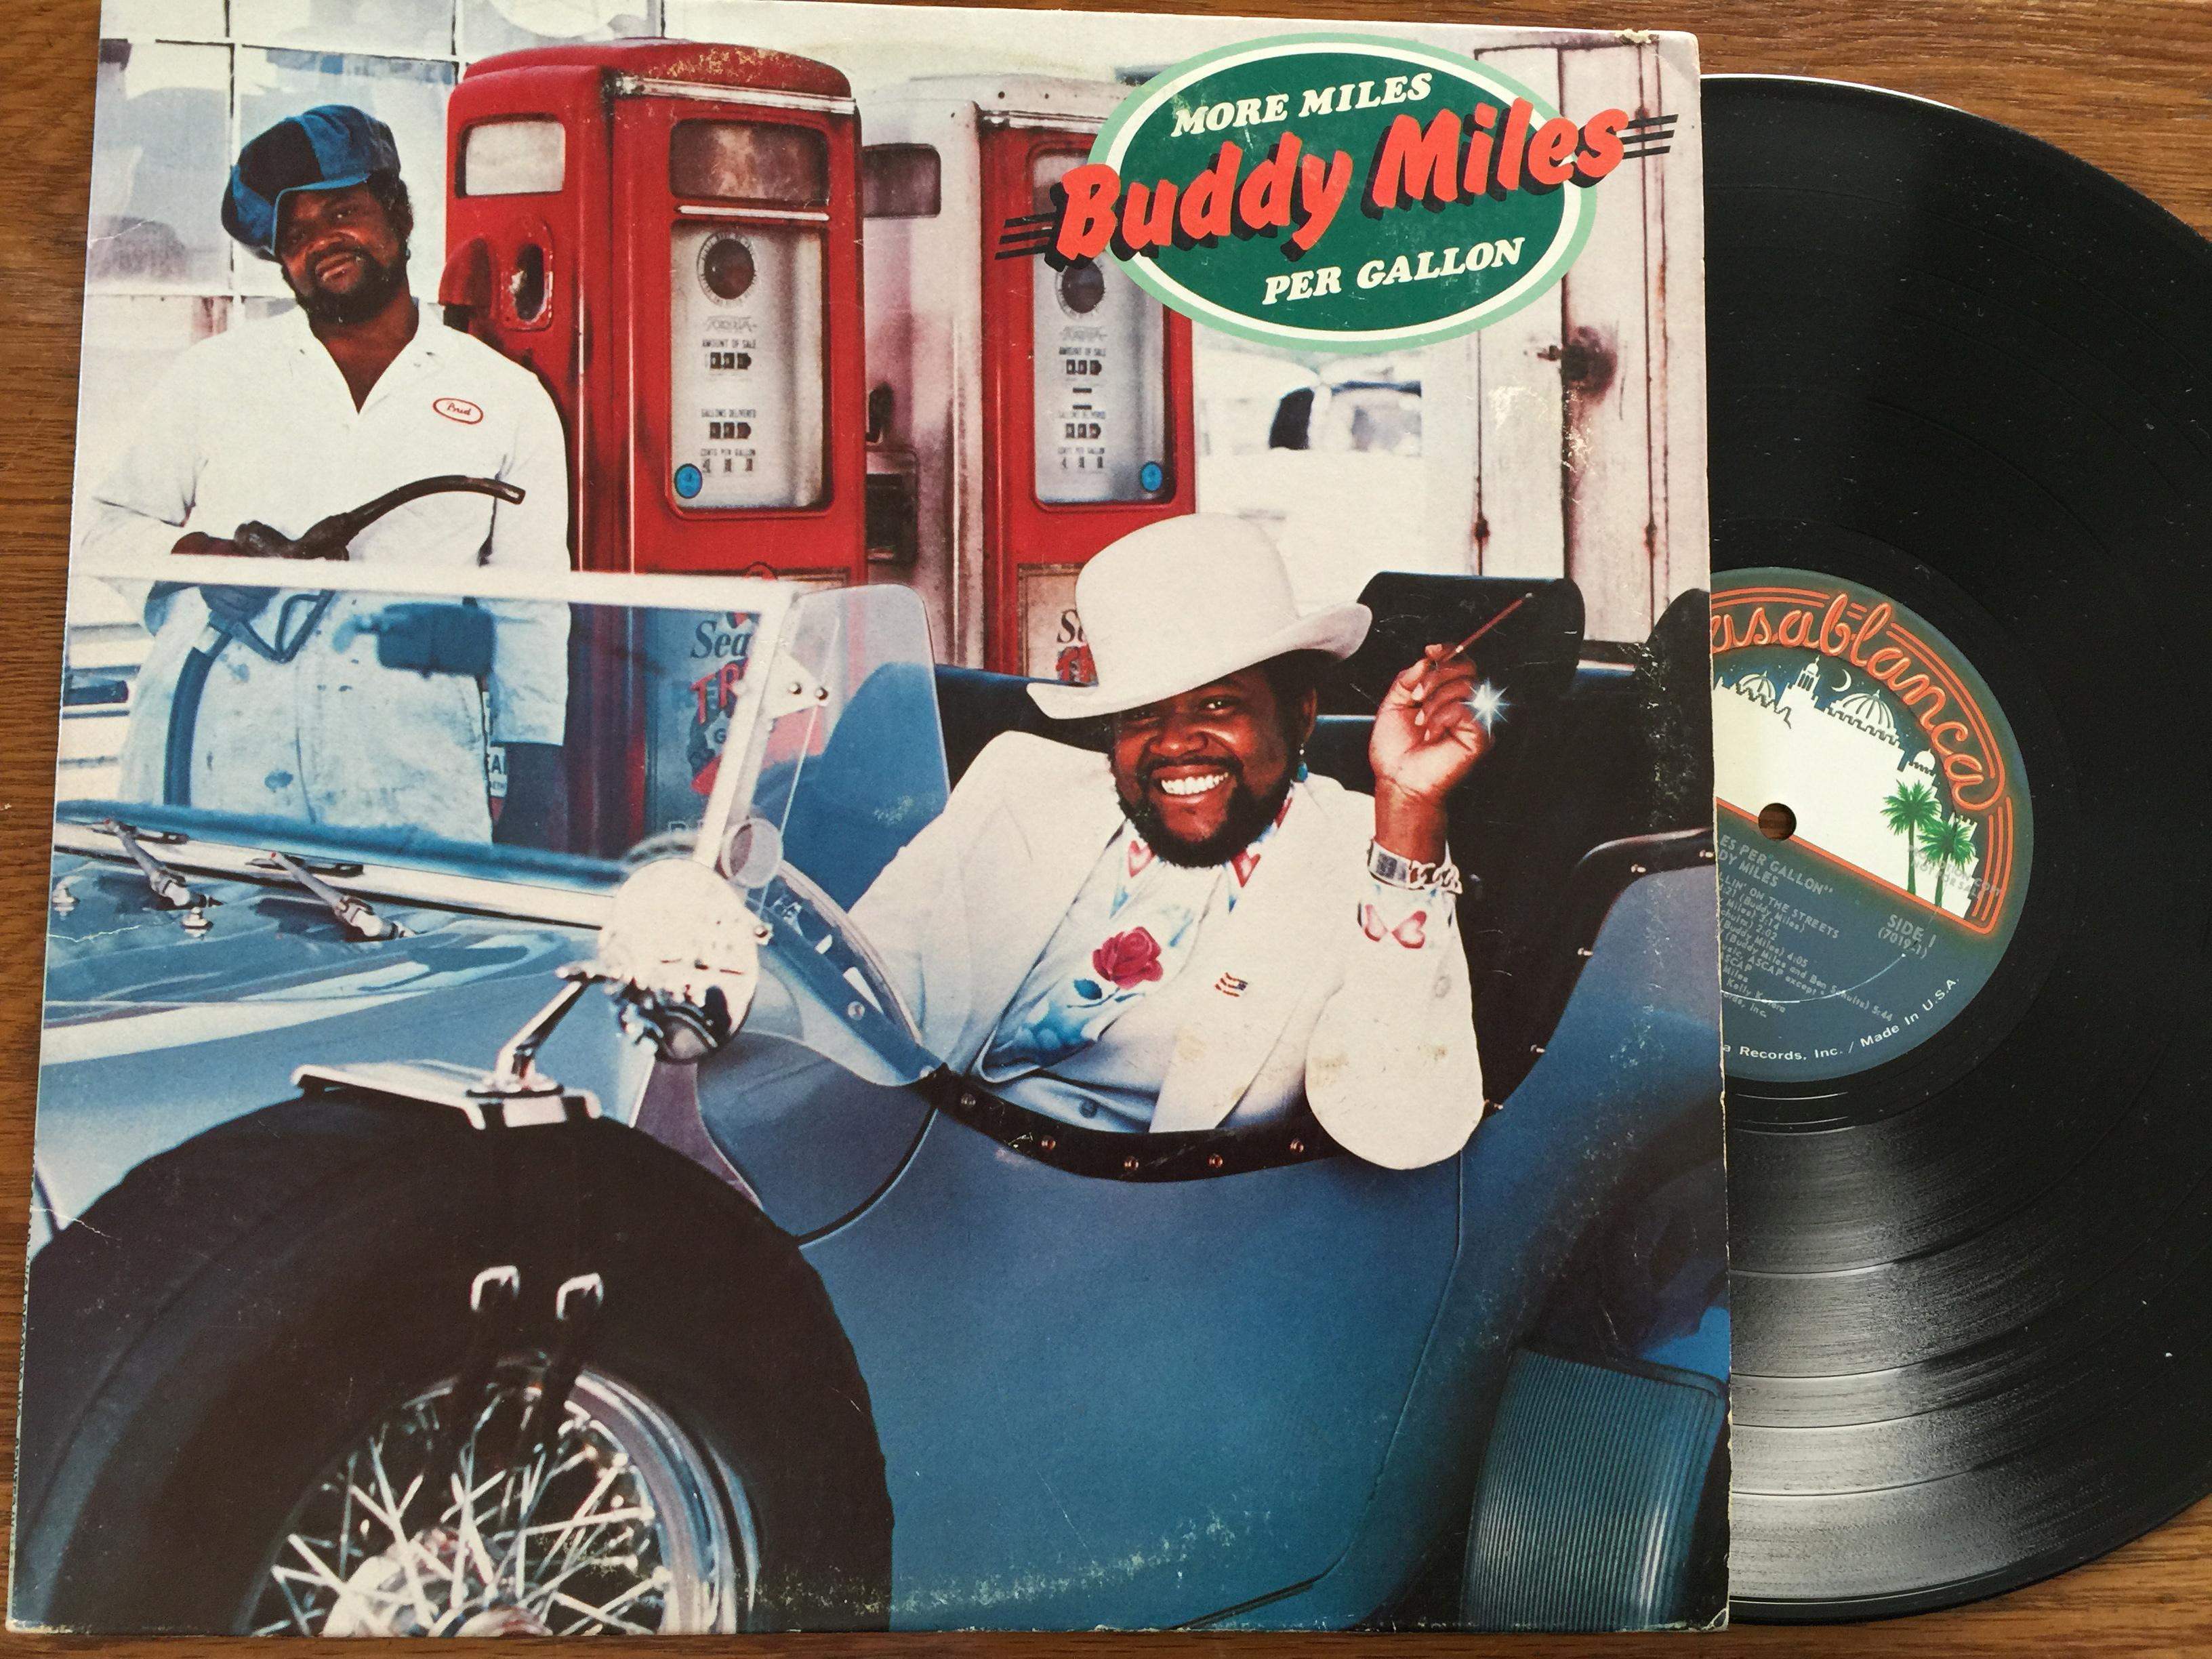 Buddy Miles More Per Gallon Vinyl Lp Record